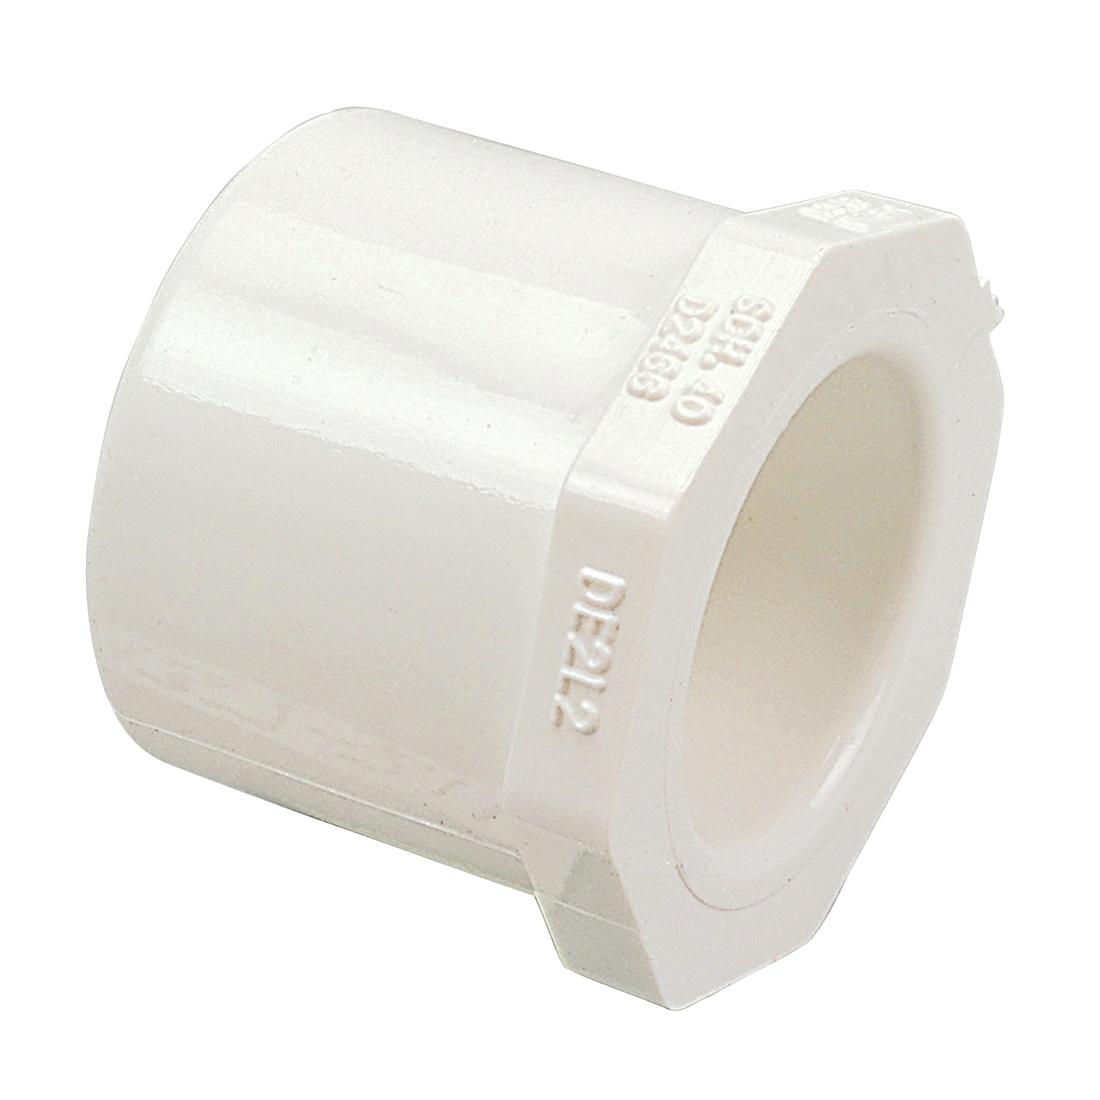 NIBCO® L17896YP 4618 Bushing, 4 x 2-1/2 in Nominal, Male Spigot x Socket End Style, SCH 40/STD, PVC, Domestic